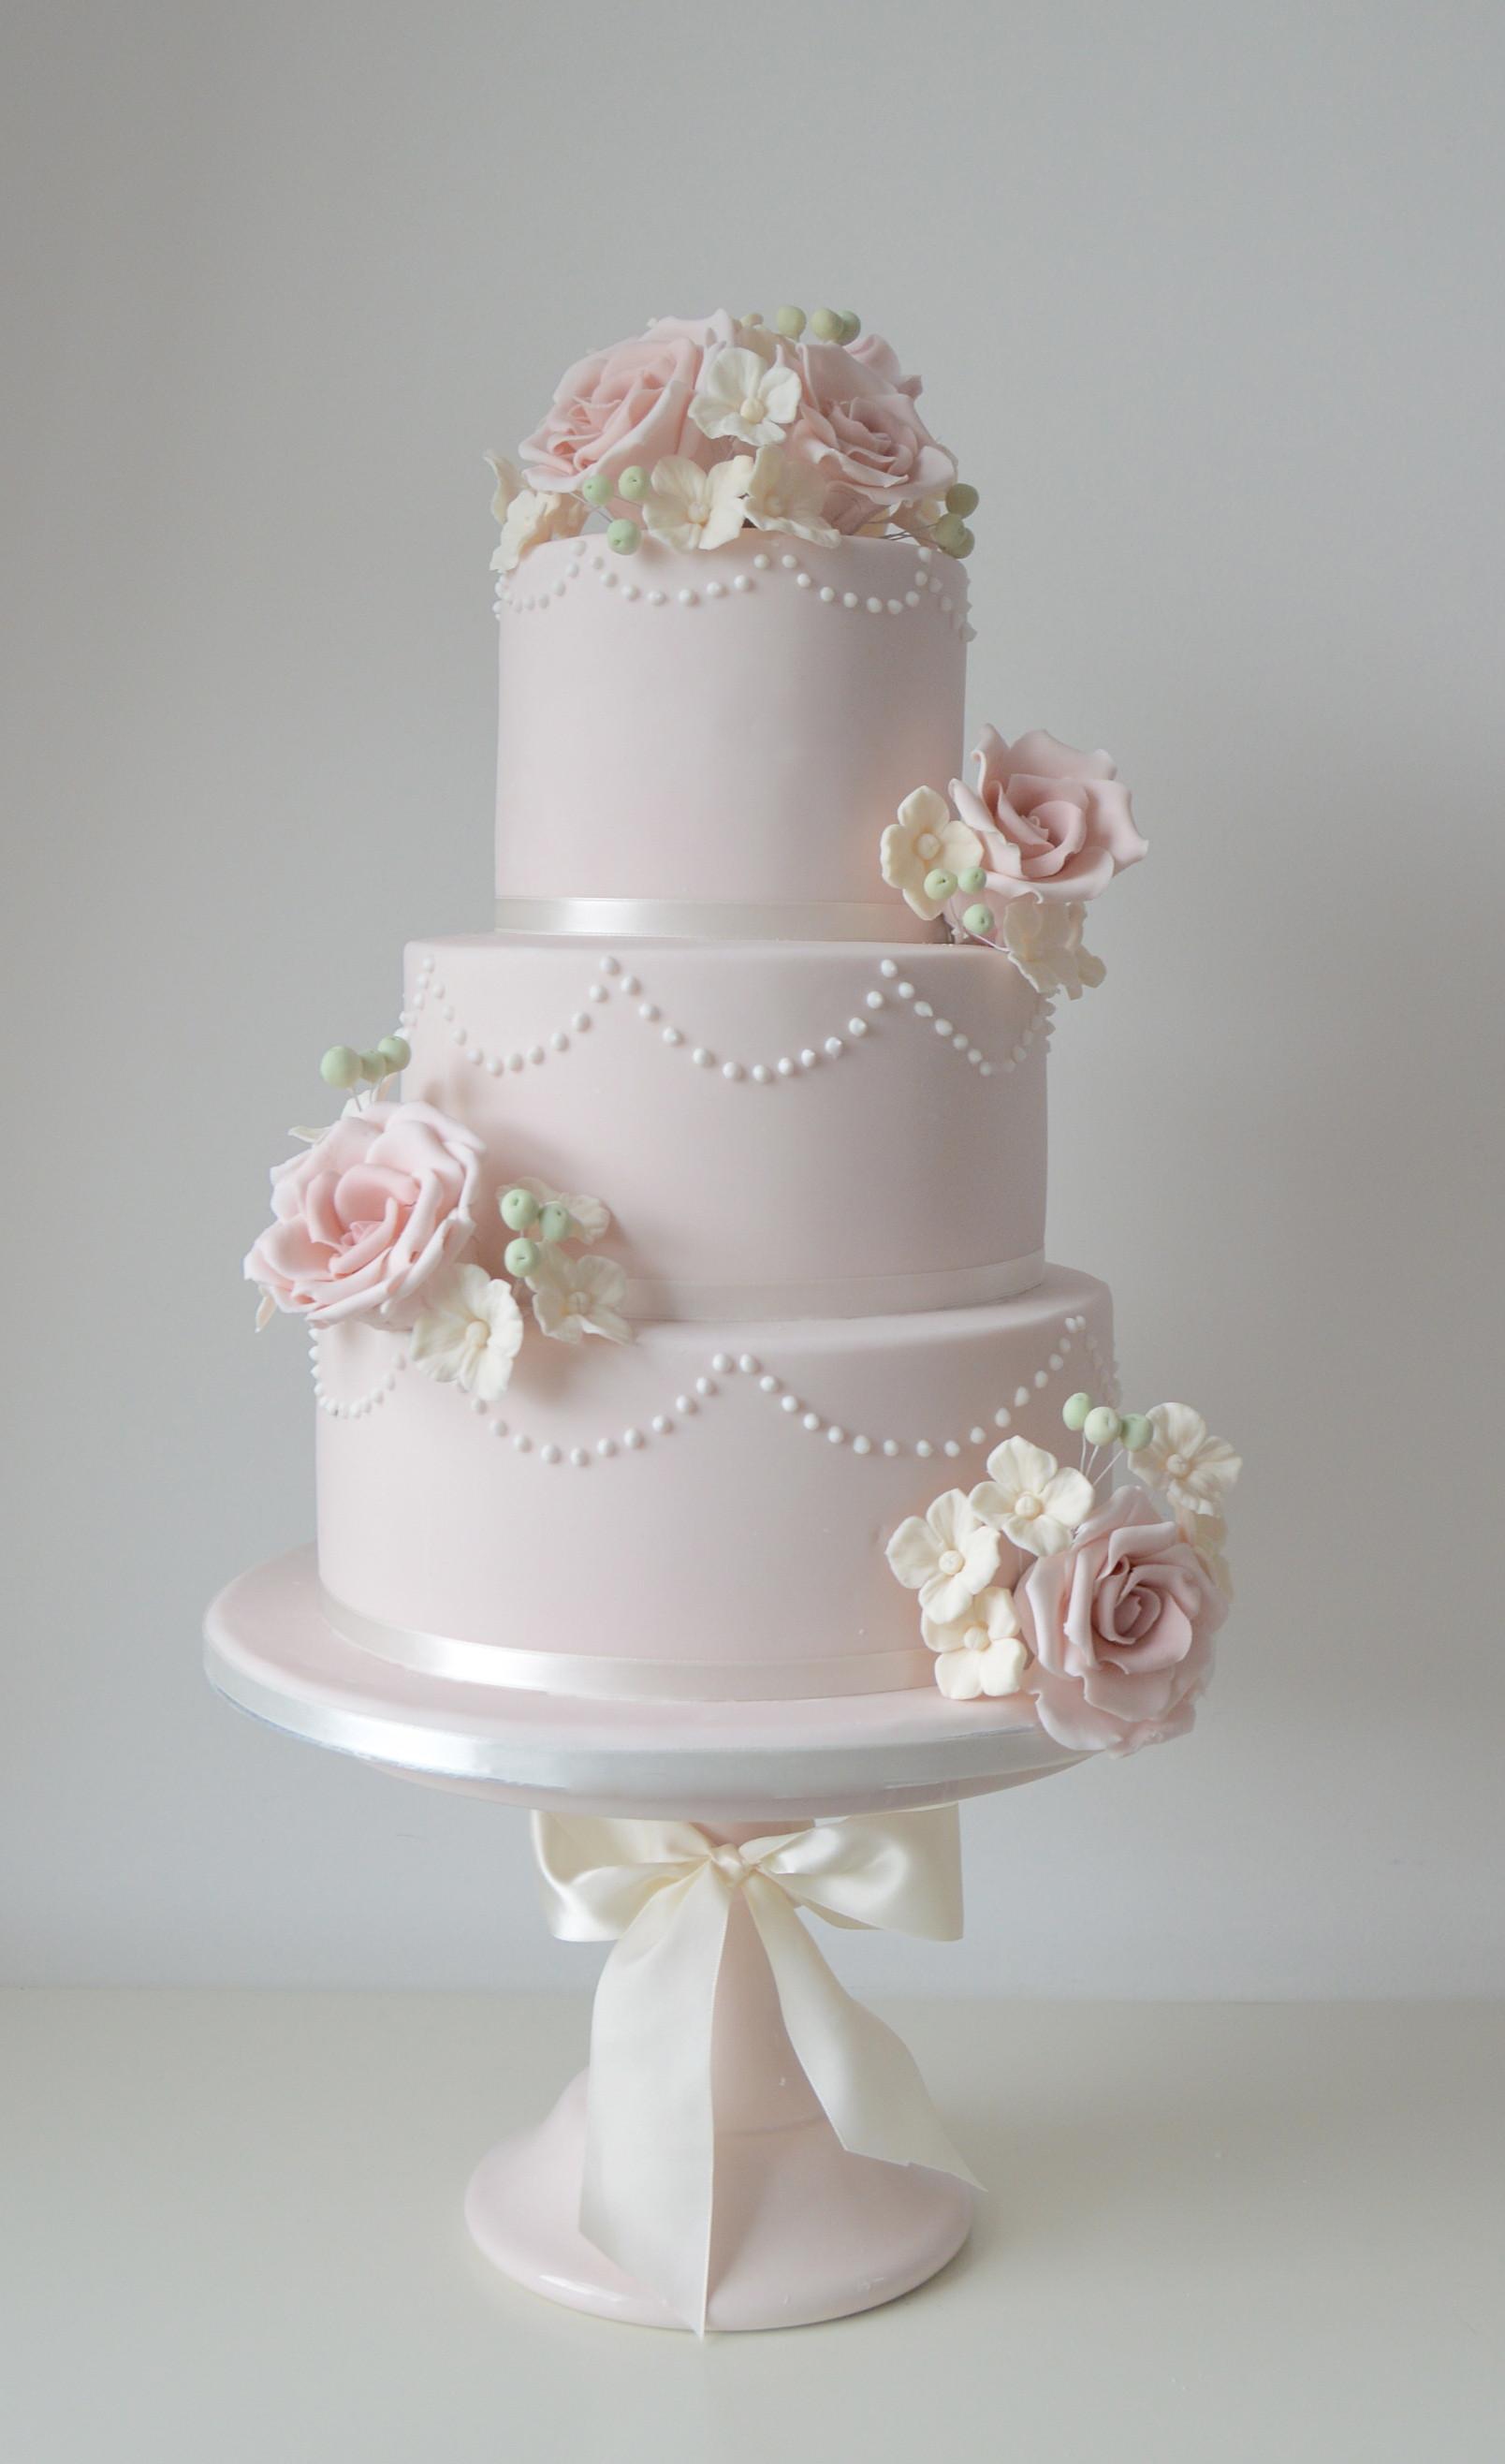 Blush Pink Wedding Cakes  Blush pink wedding cakes idea in 2017